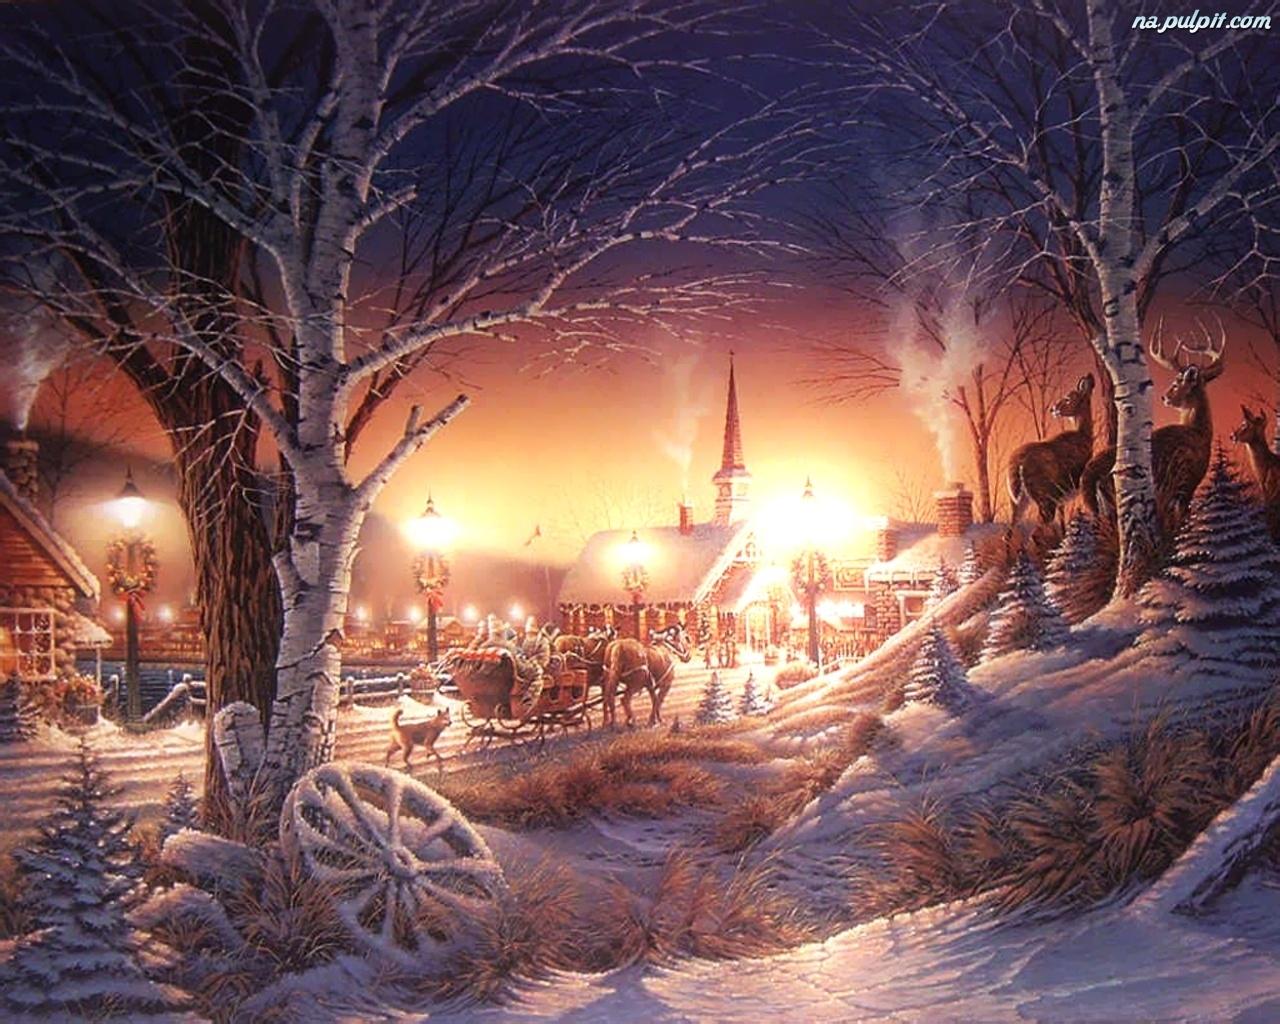 Wi teczny czas na pulpit for Sfondi invernali hd